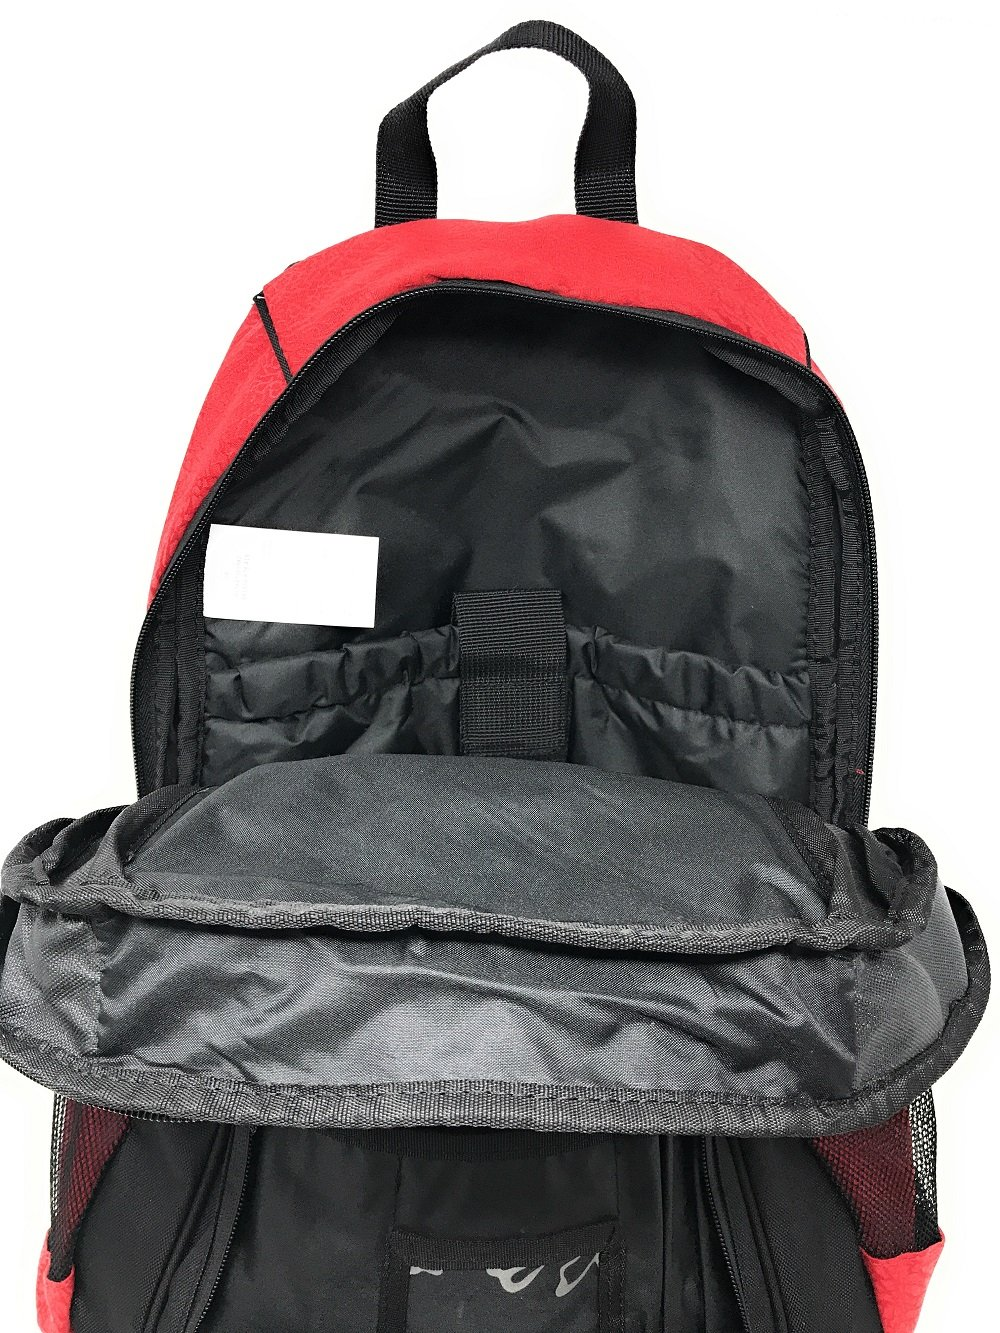 Nike Air Jordan Legacy Legacy Legacy Elite schwarz rot Rucksack 50,8 cm Schultasche B07FN4VT9Y Daypacks Verkaufspreis 00eeb9